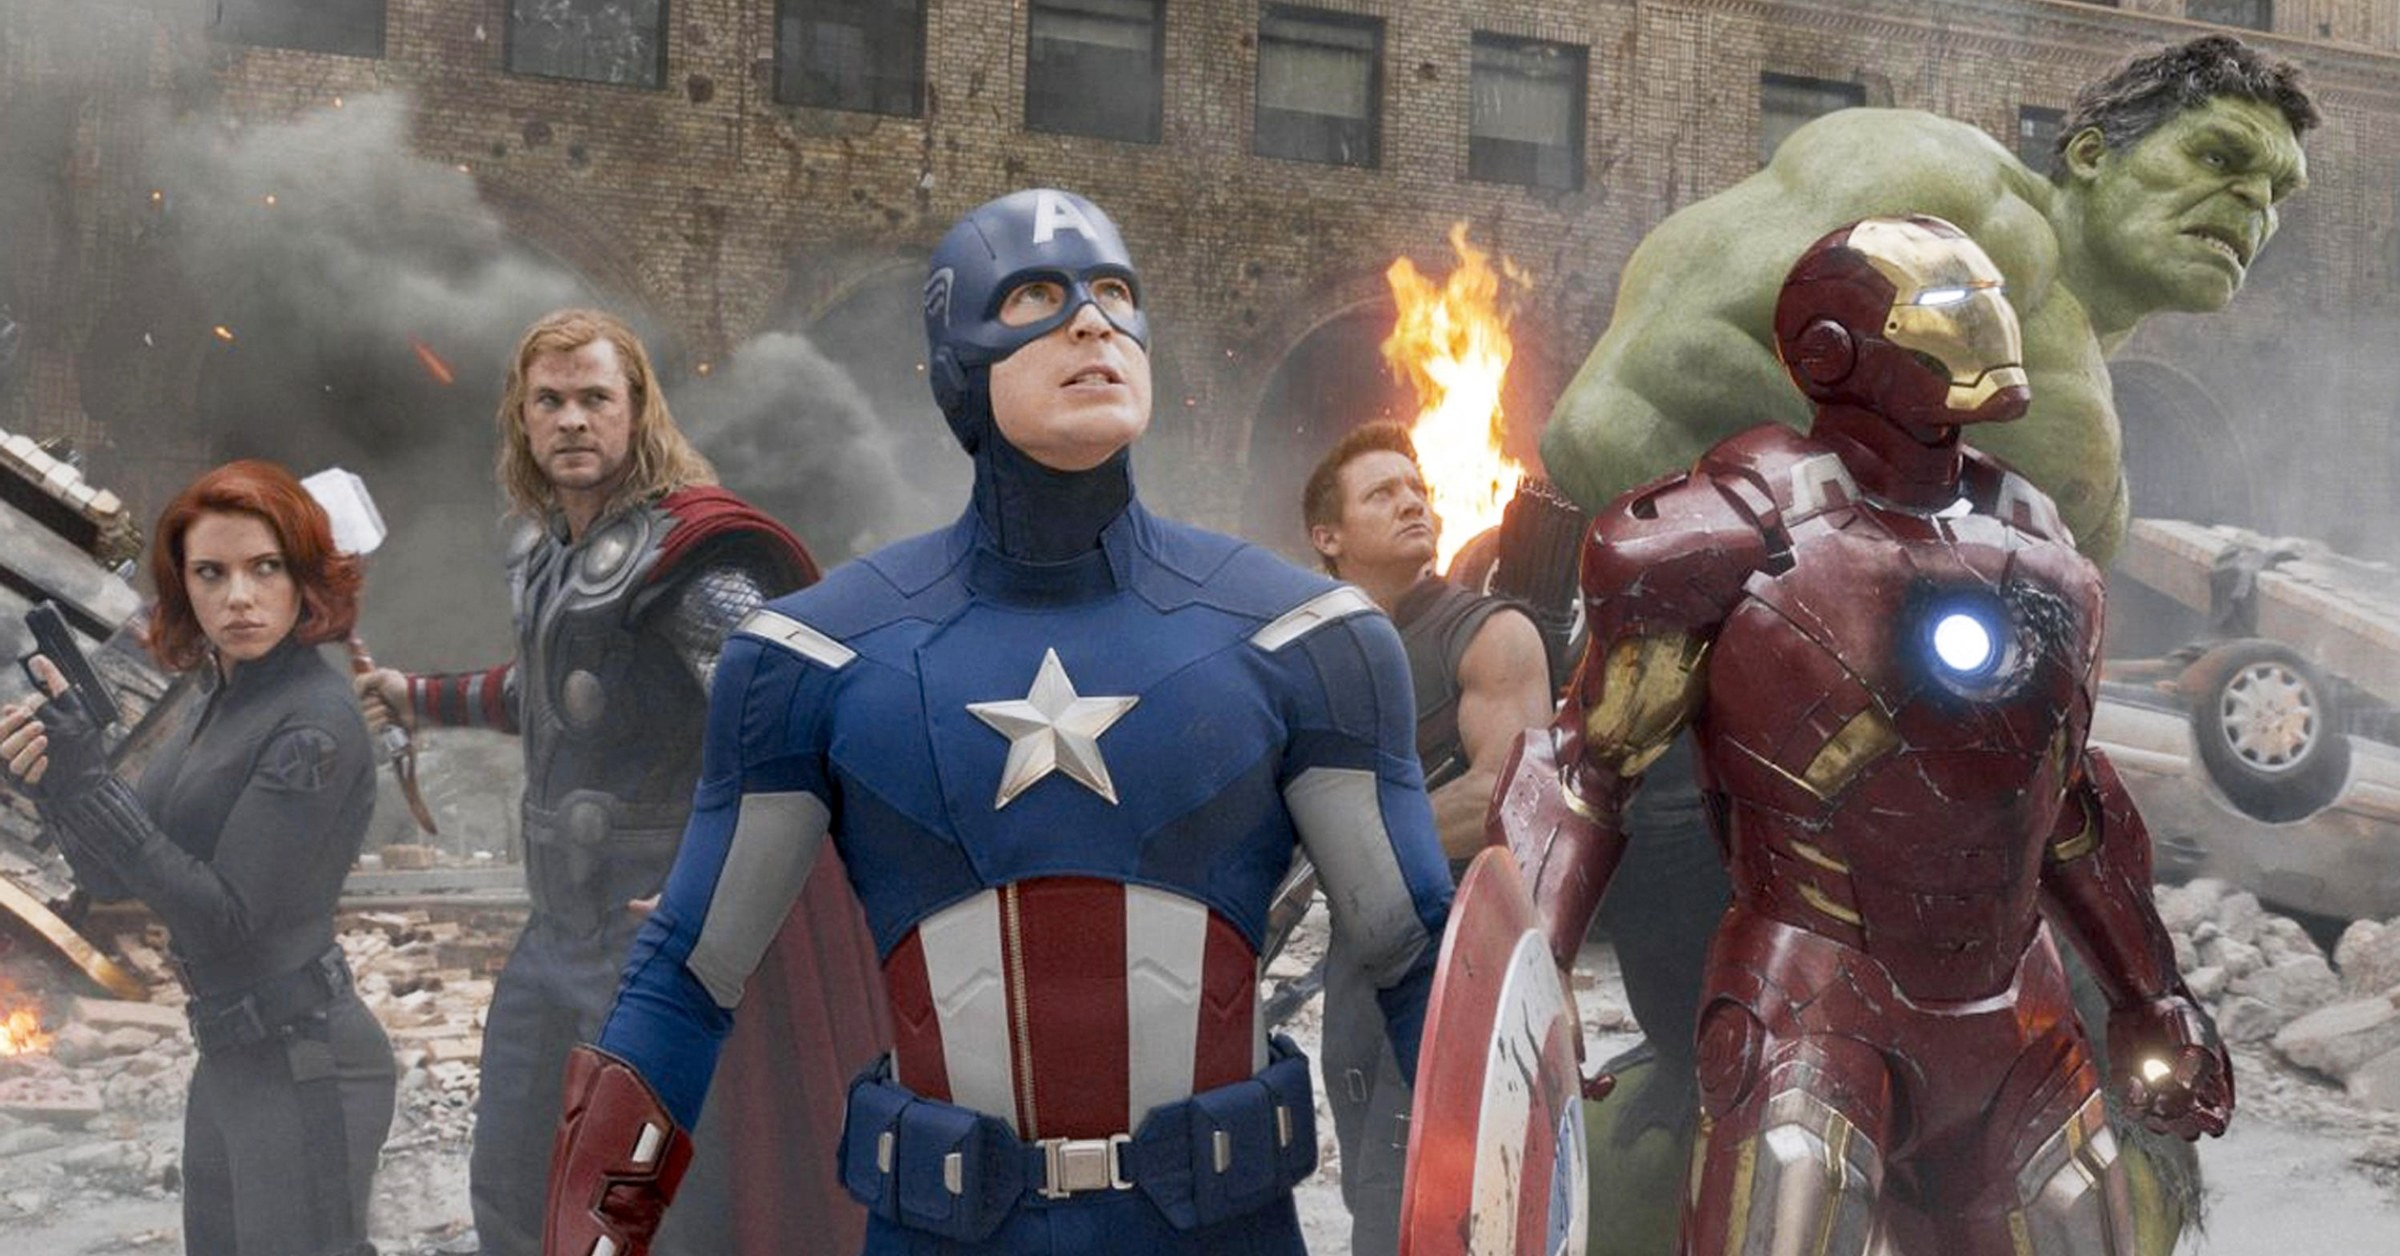 The Original Six Members of the Avengers in MCU